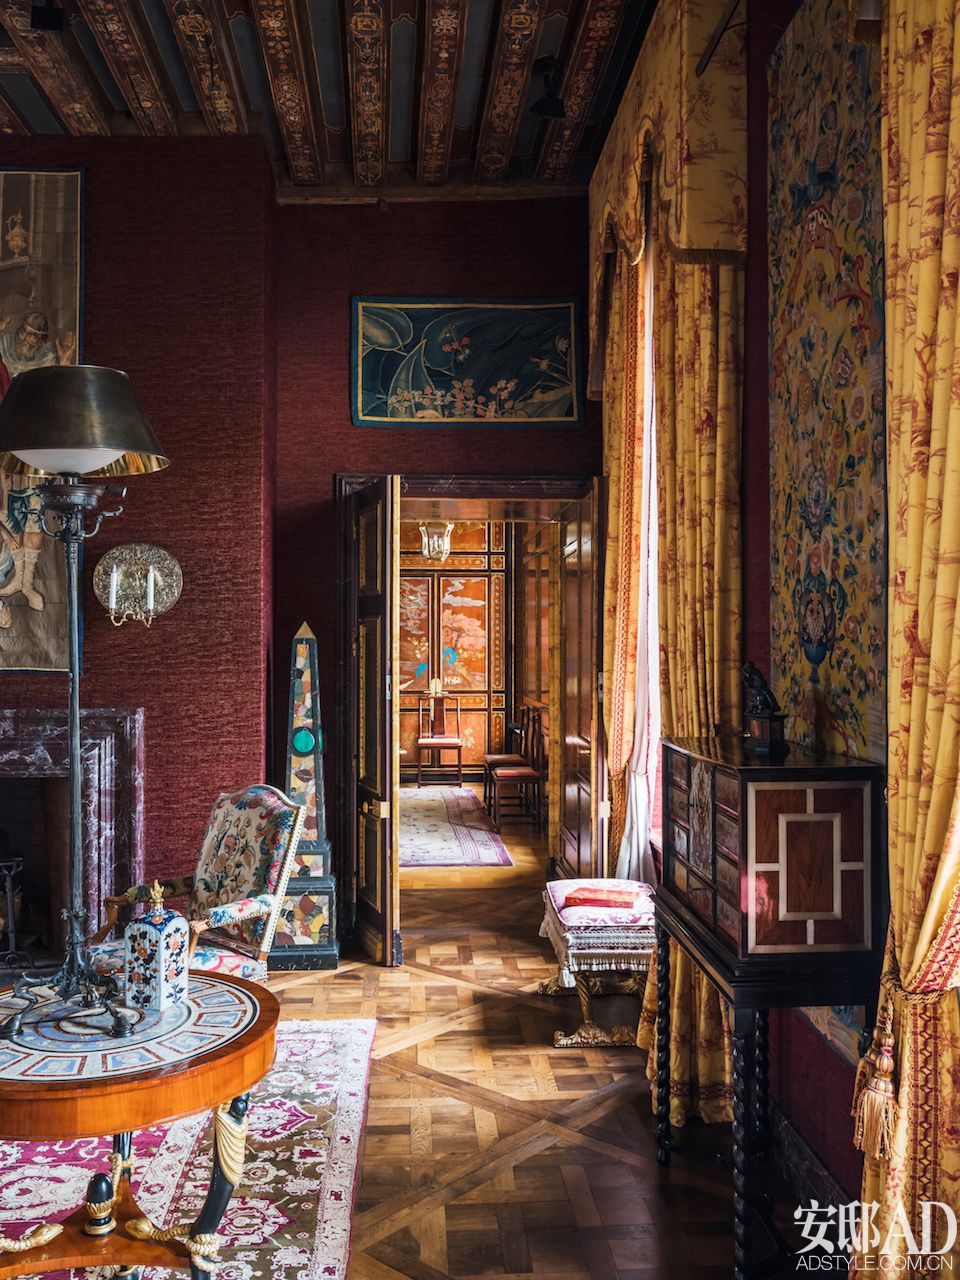 Luxury Showcase For Living Room Royal Art Deco: American Chilean Designer Juan Pablo Molyneux Created A